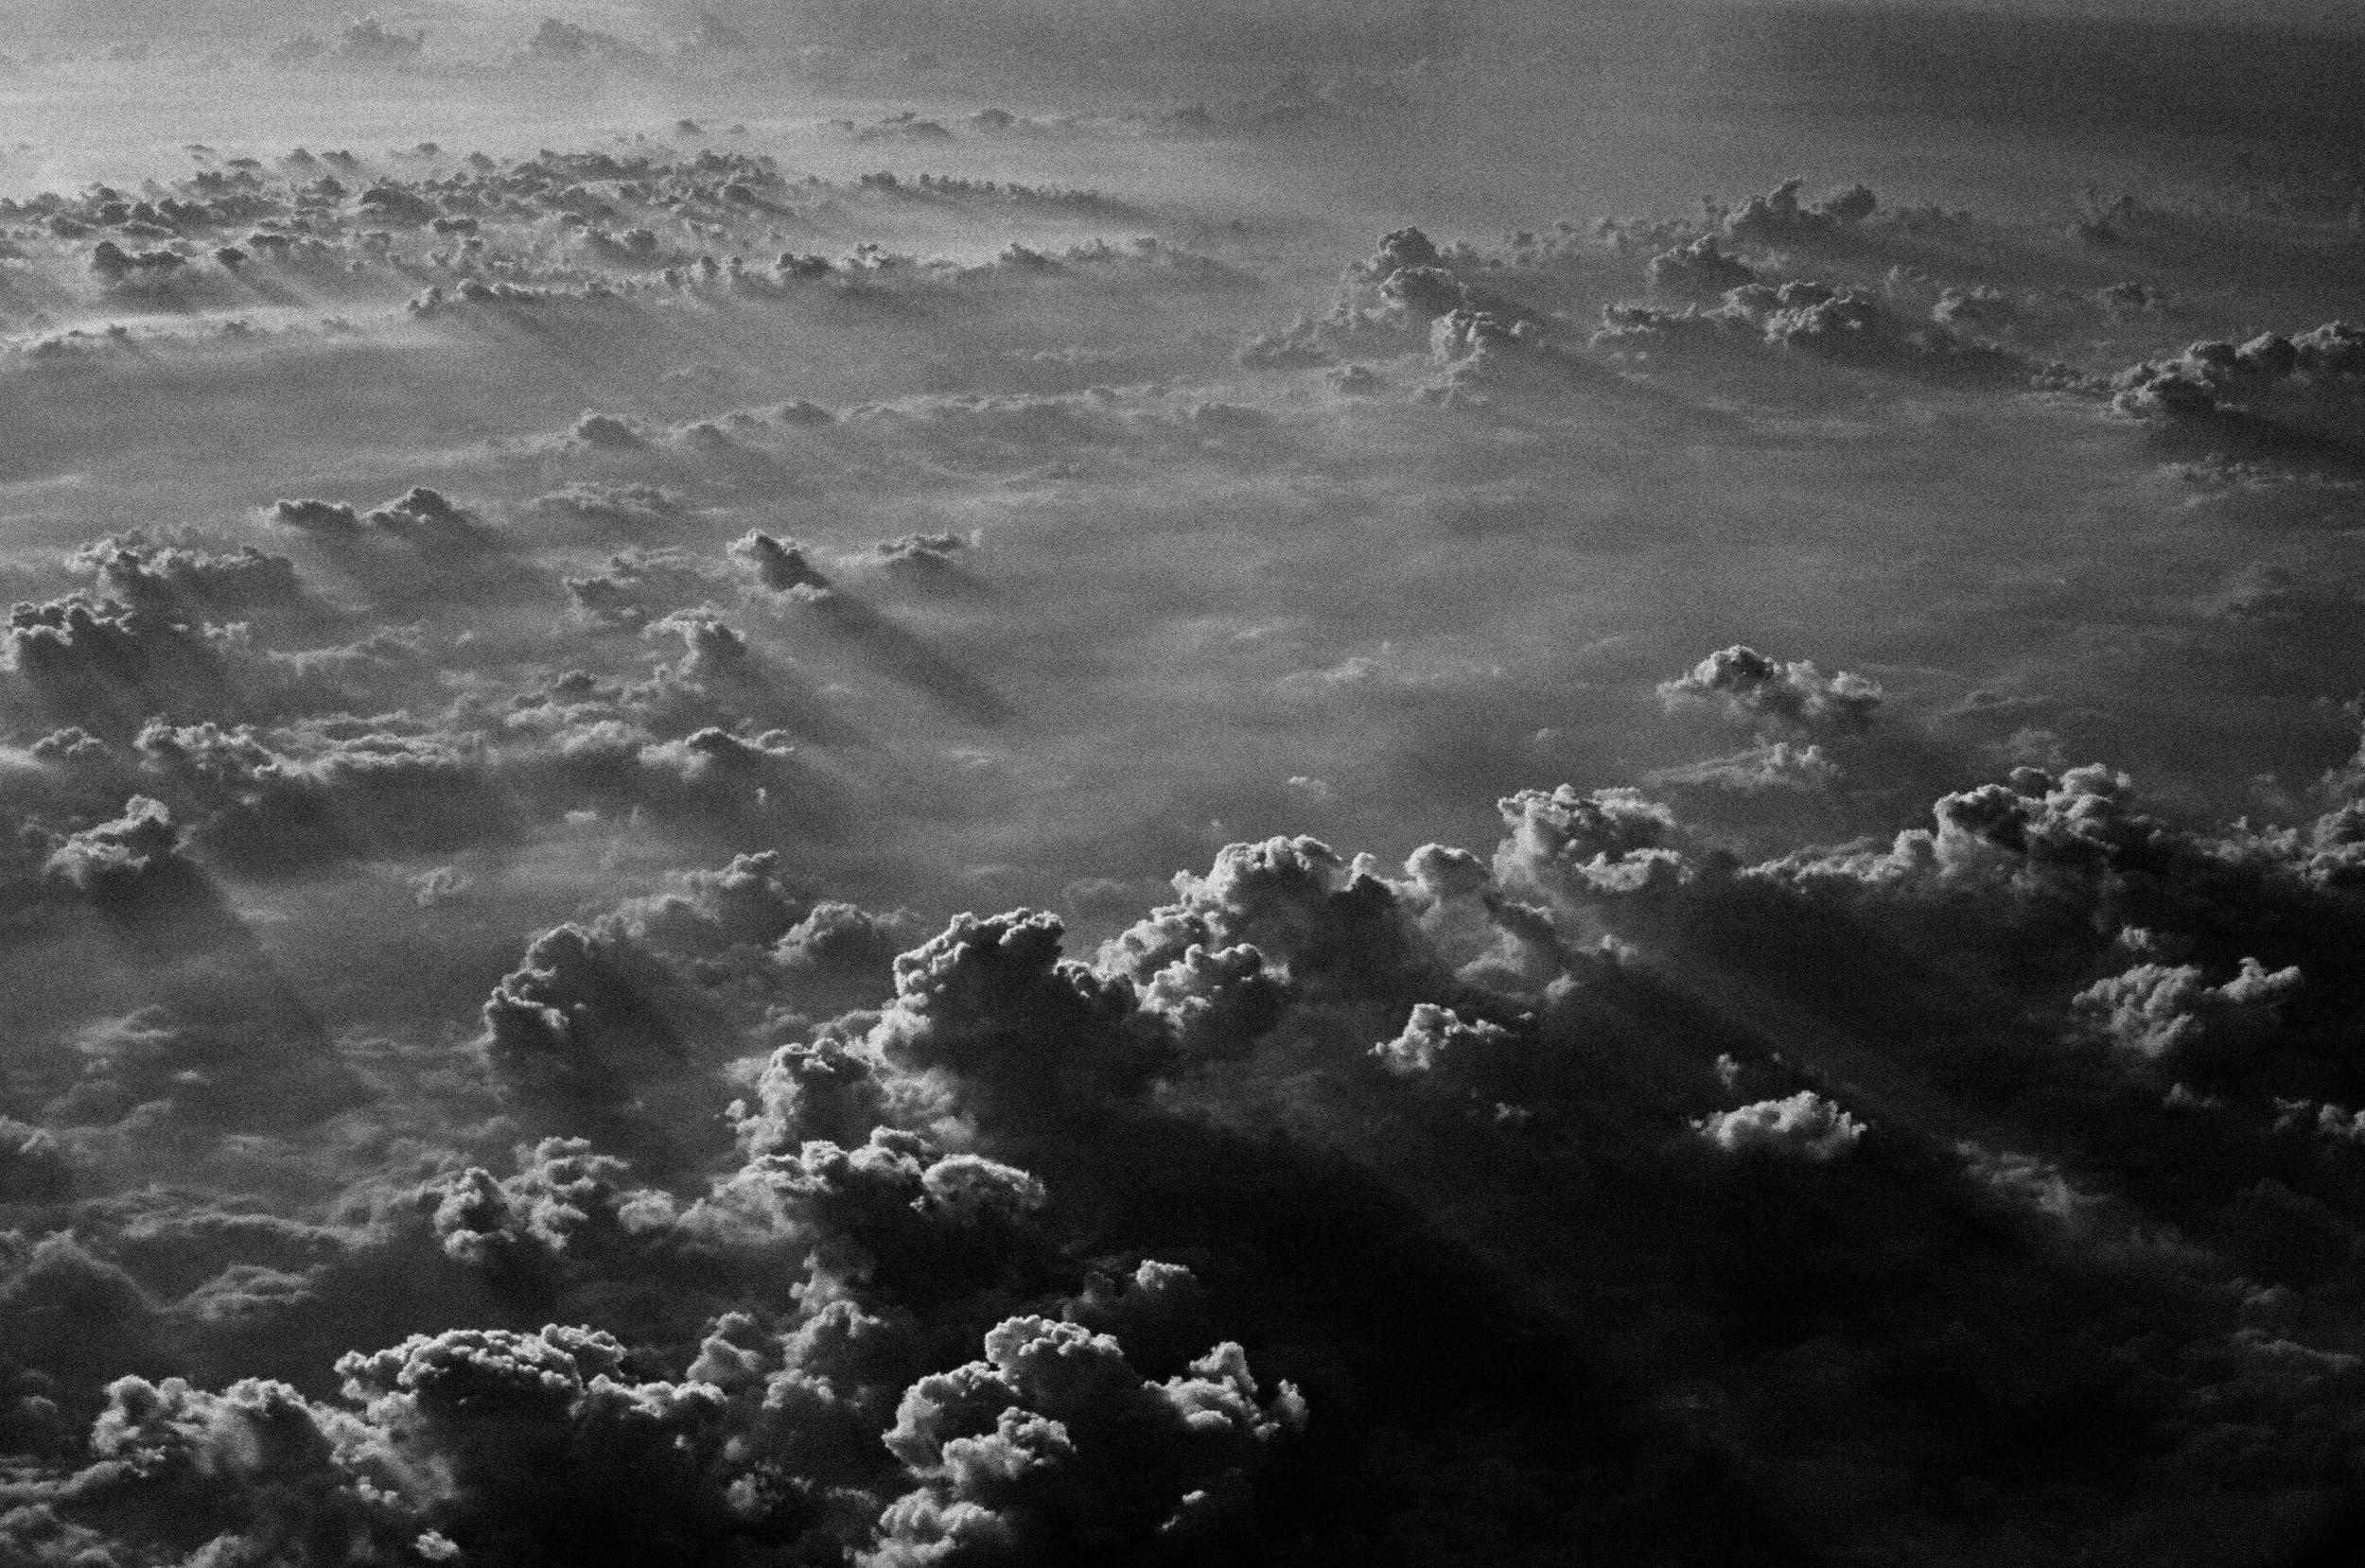 Cloud in Black & White